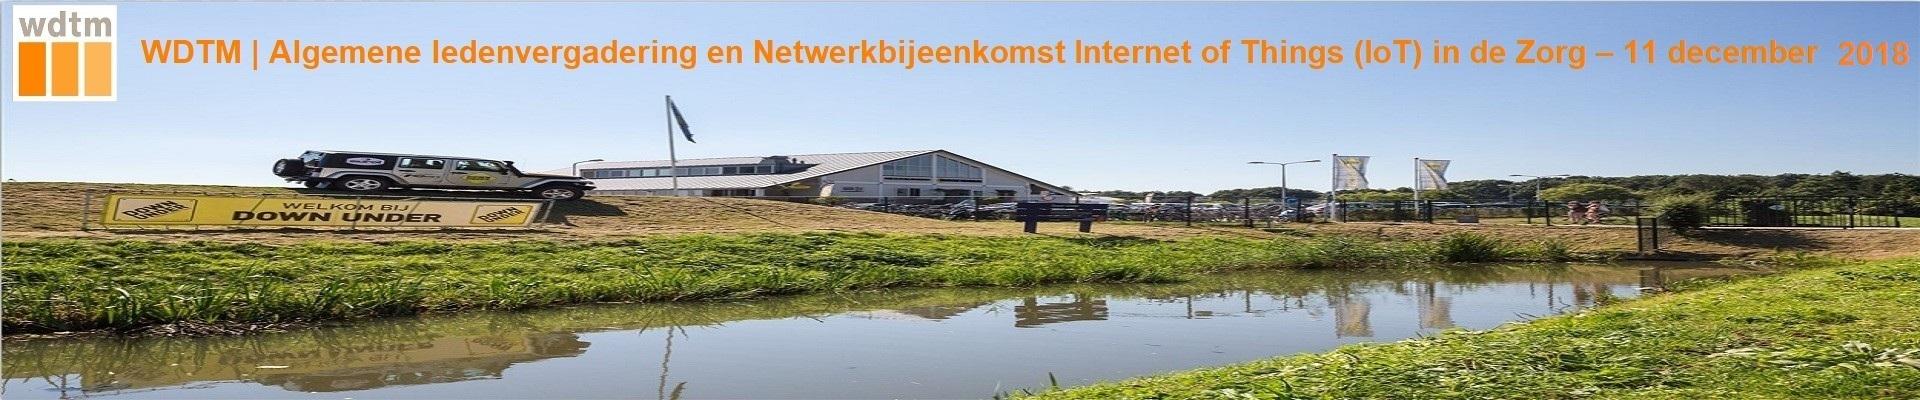 WDTM Algemene Ledenvergadering en Netwerkbijeenkomst Internet of Things in de Zorg